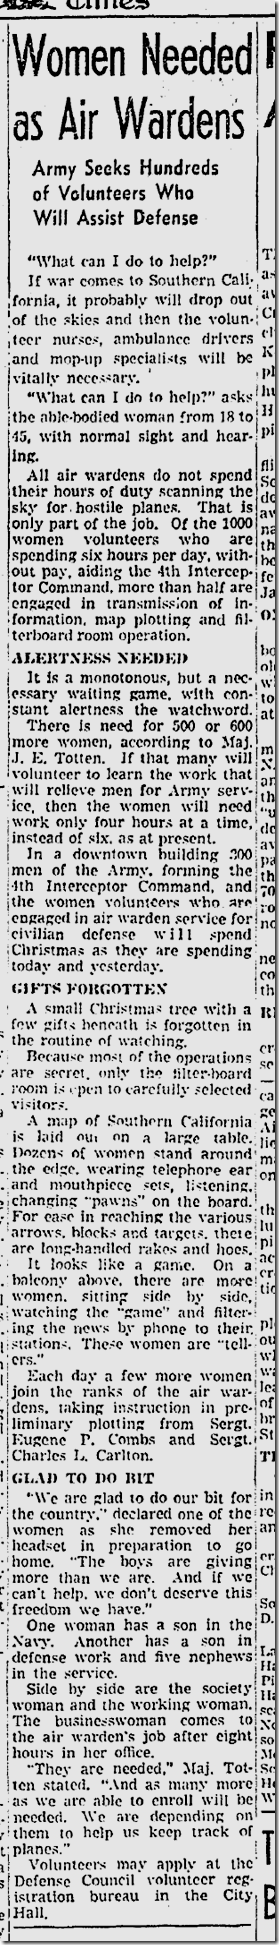 Dec. 24, 1941, Women Needed as Air Raid Wardens